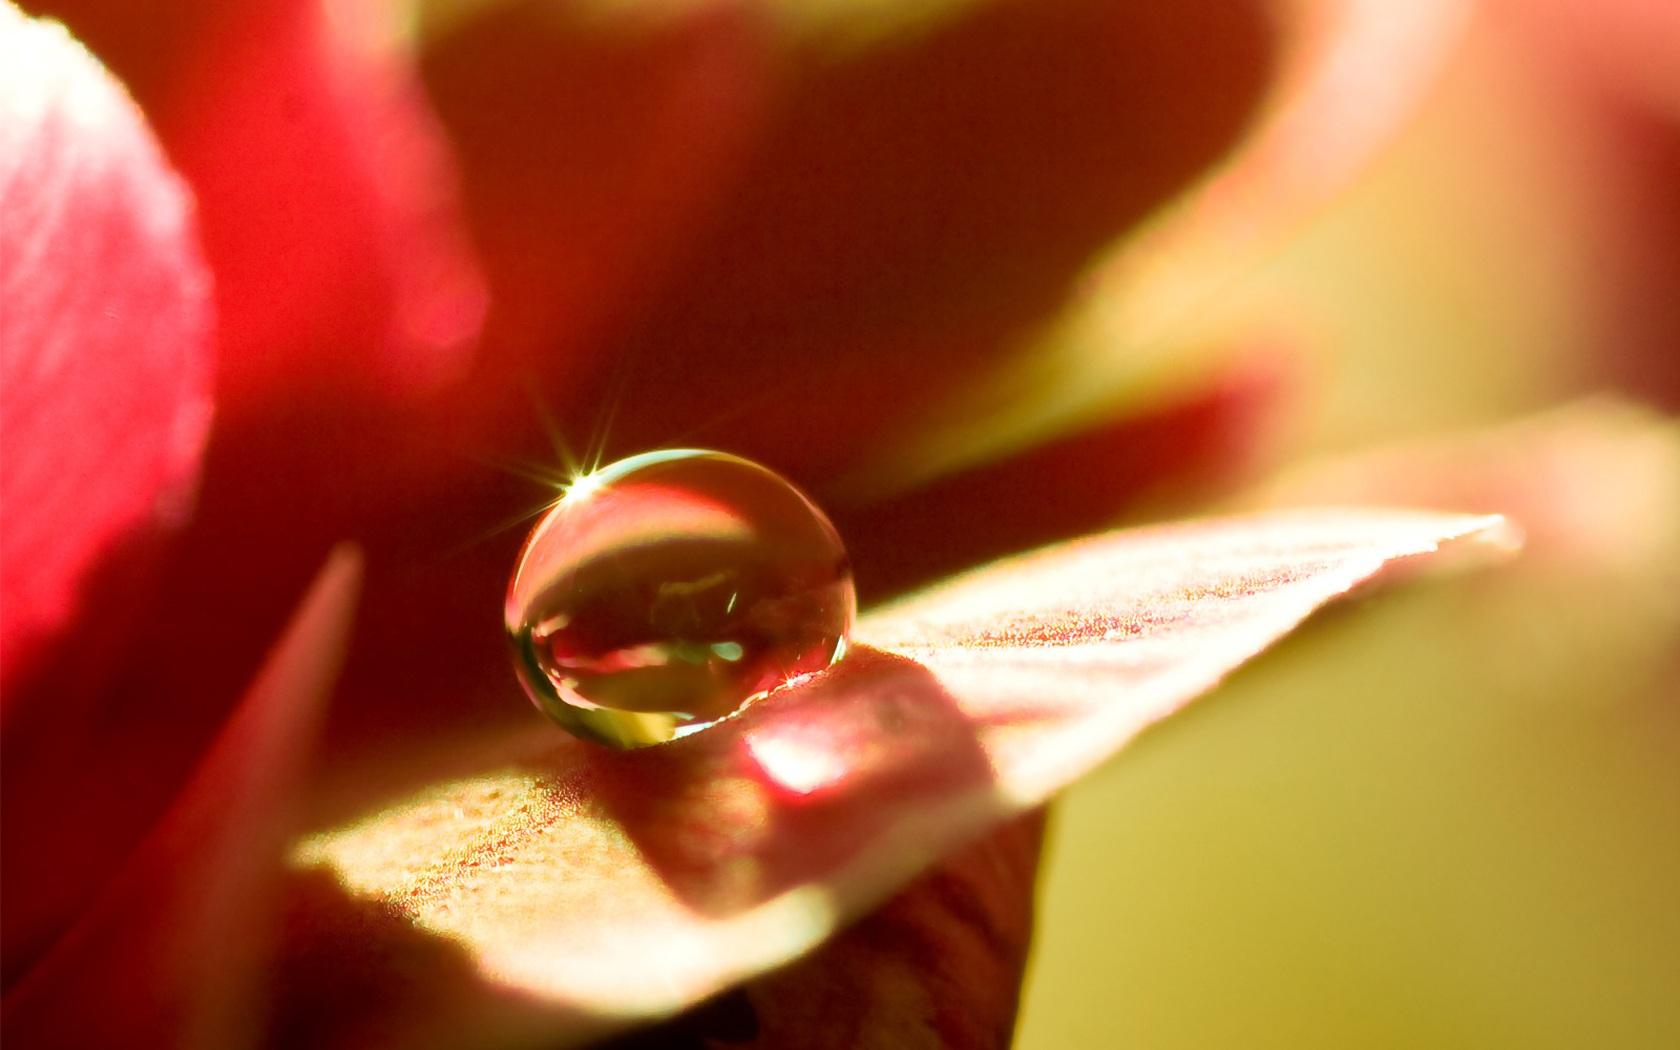 Flower with waterdrop morning scene crystal clear waterdrop